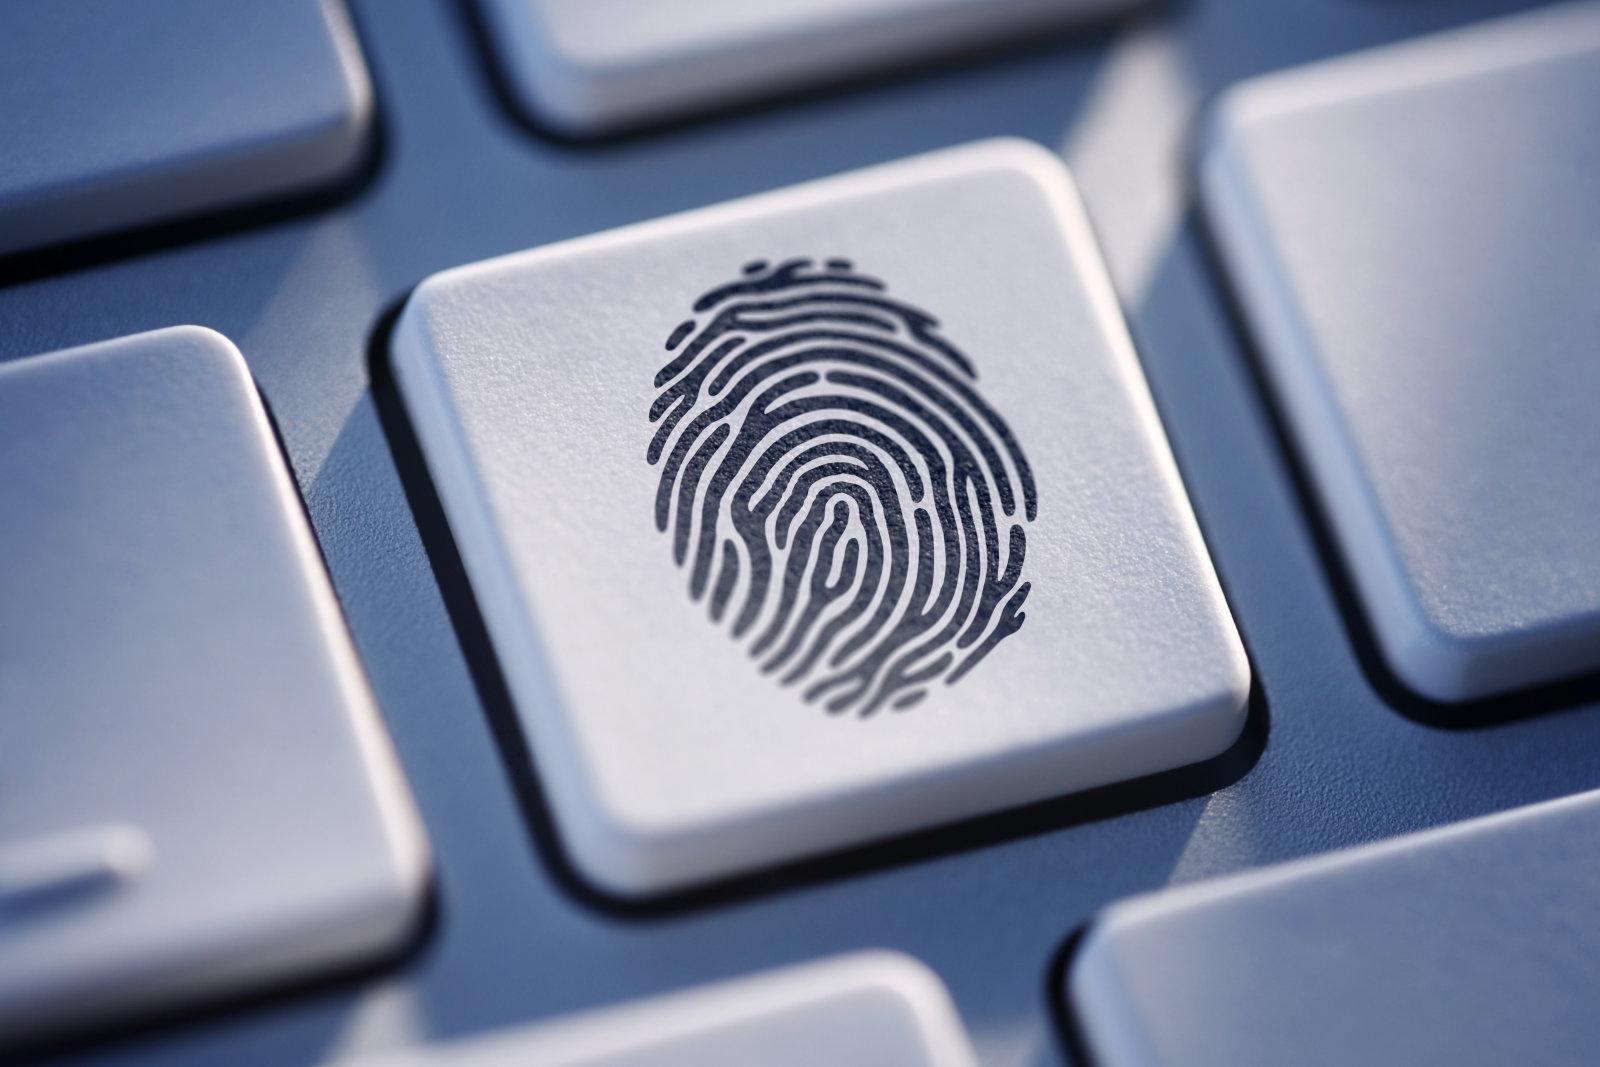 Google, Microsoft и Mozilla поддержат стандарт WebAuthn, предлагающий аутентификацию без паролей